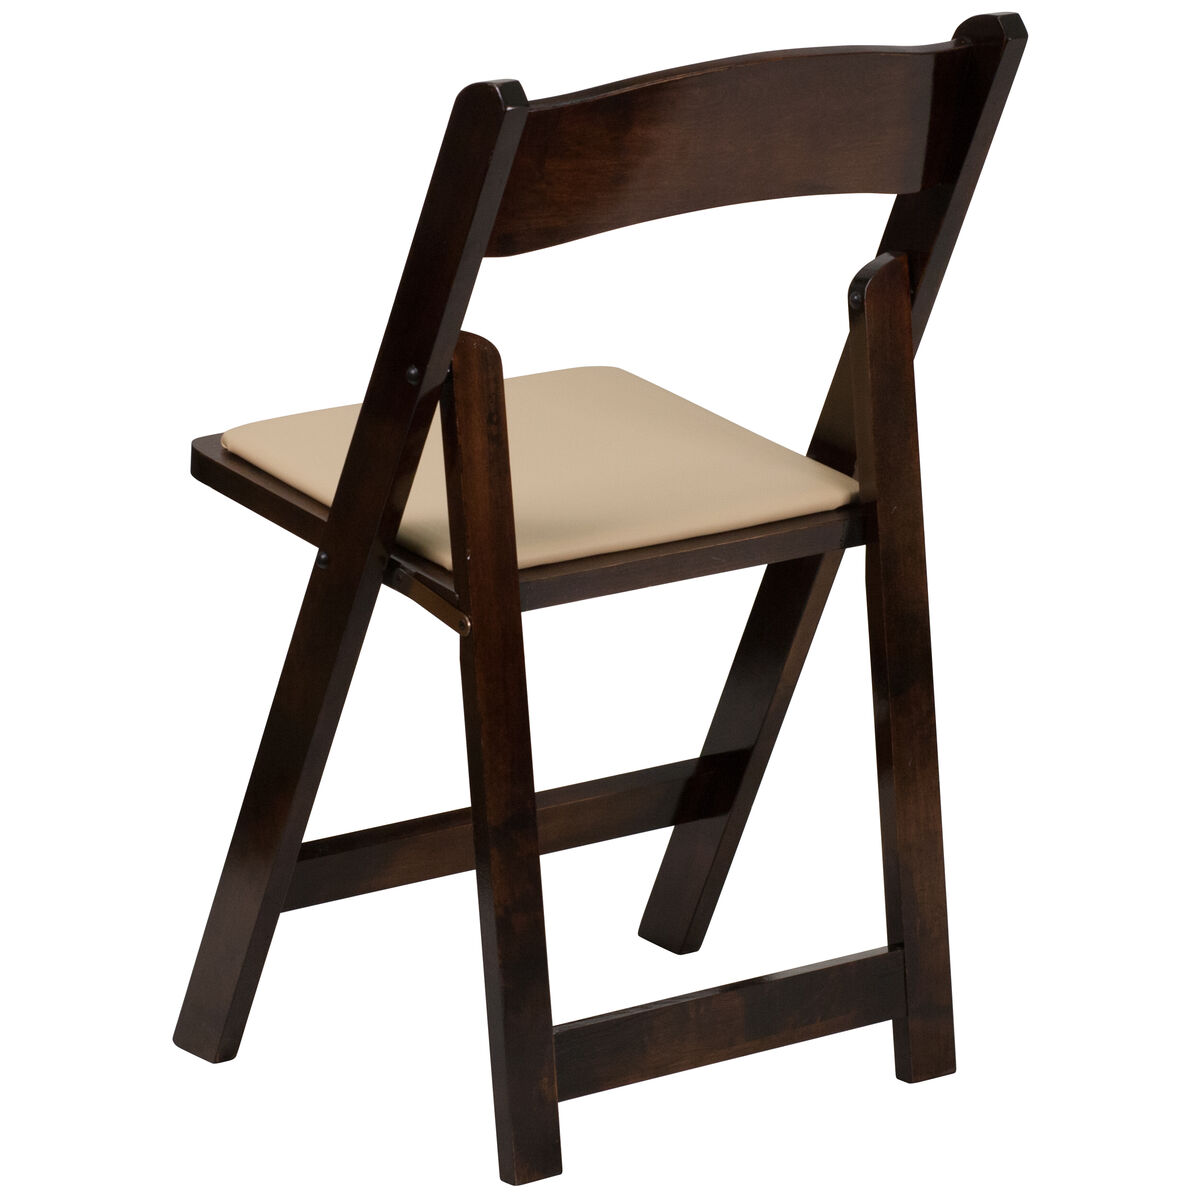 Fruitwood Folding Chair Xf 2903 Fruit Wood Gg